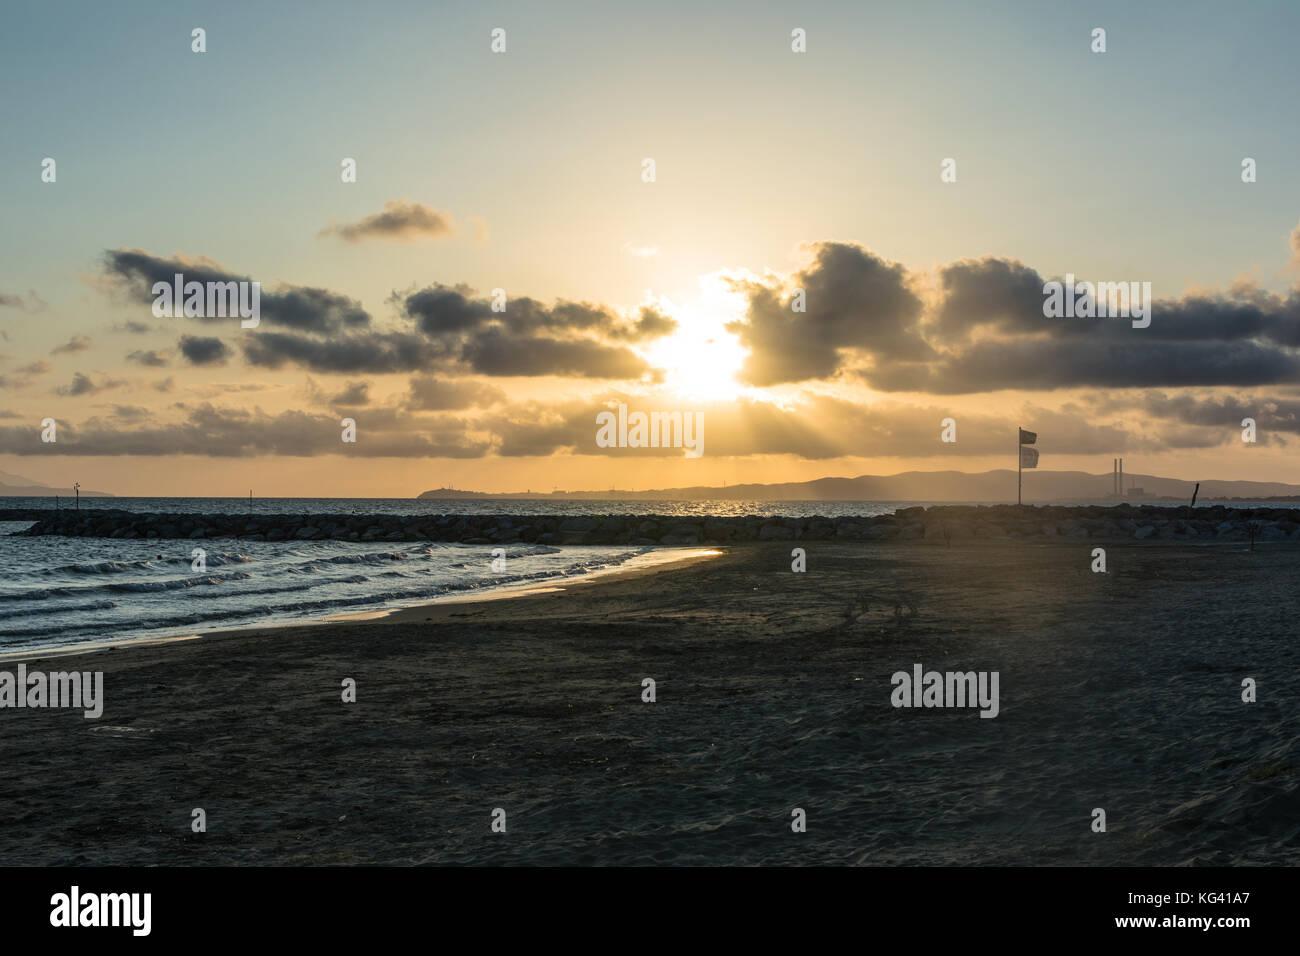 Sunset in Piombino, Italy - Stock Image